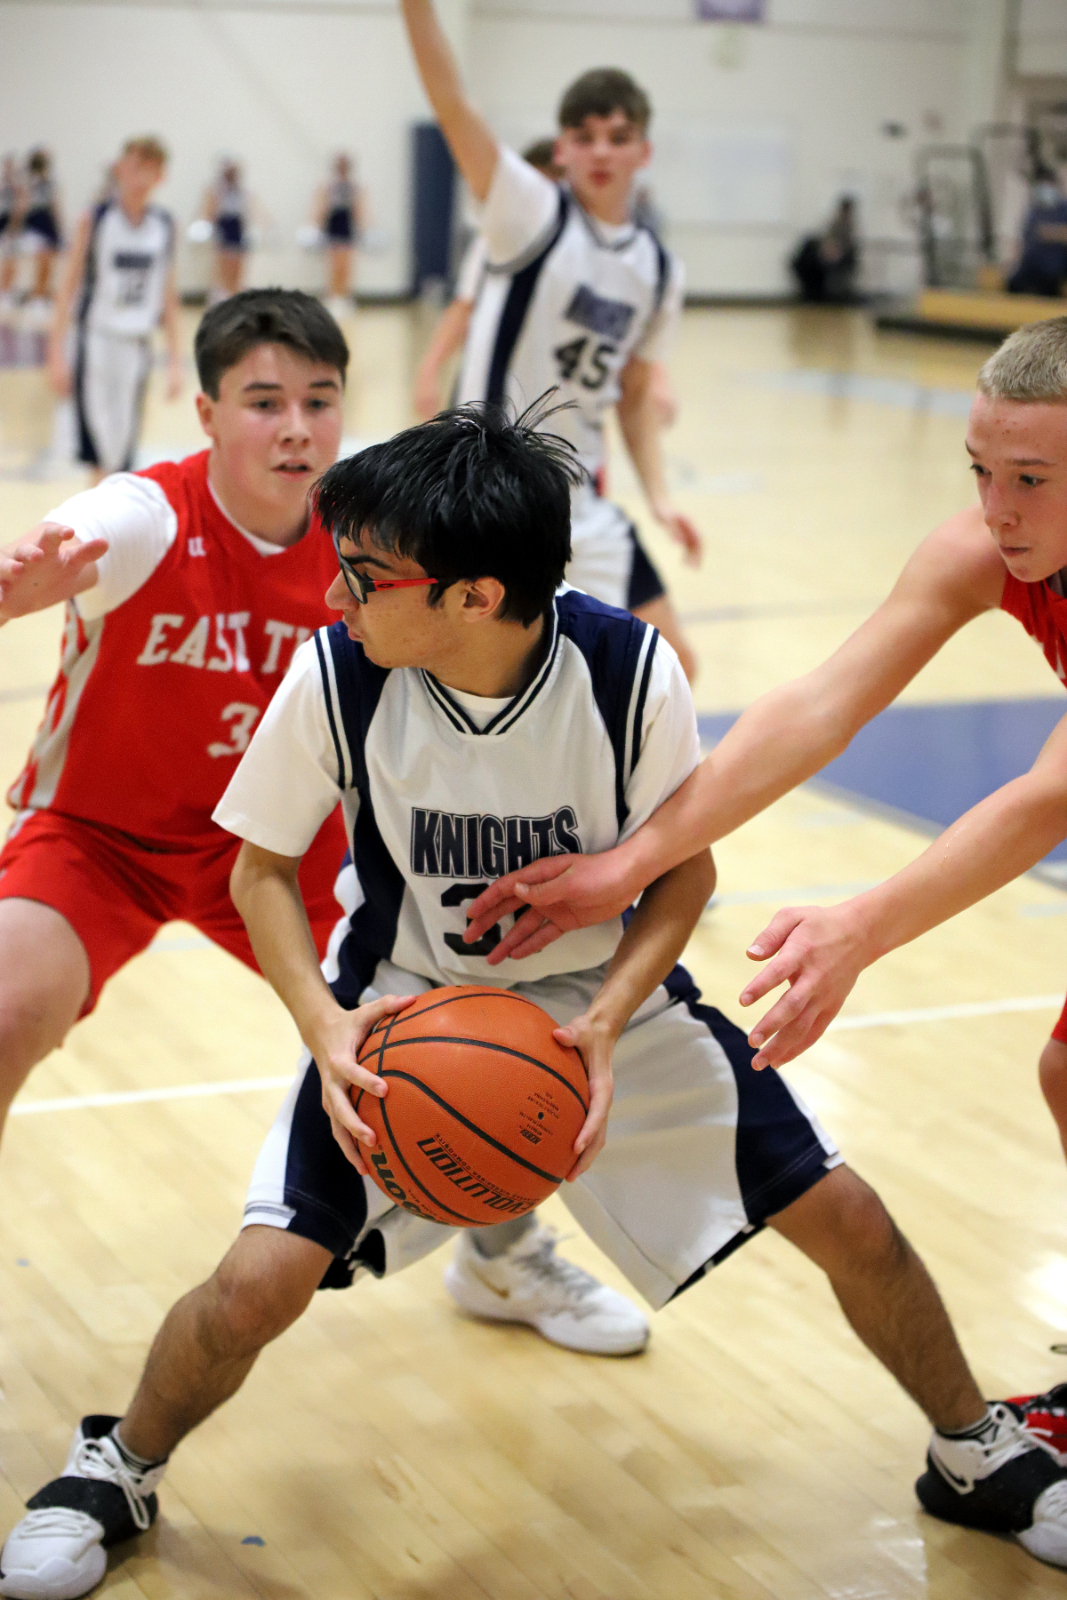 CC 8th Grade Boys Basketball vs East Tipp 12-2-20